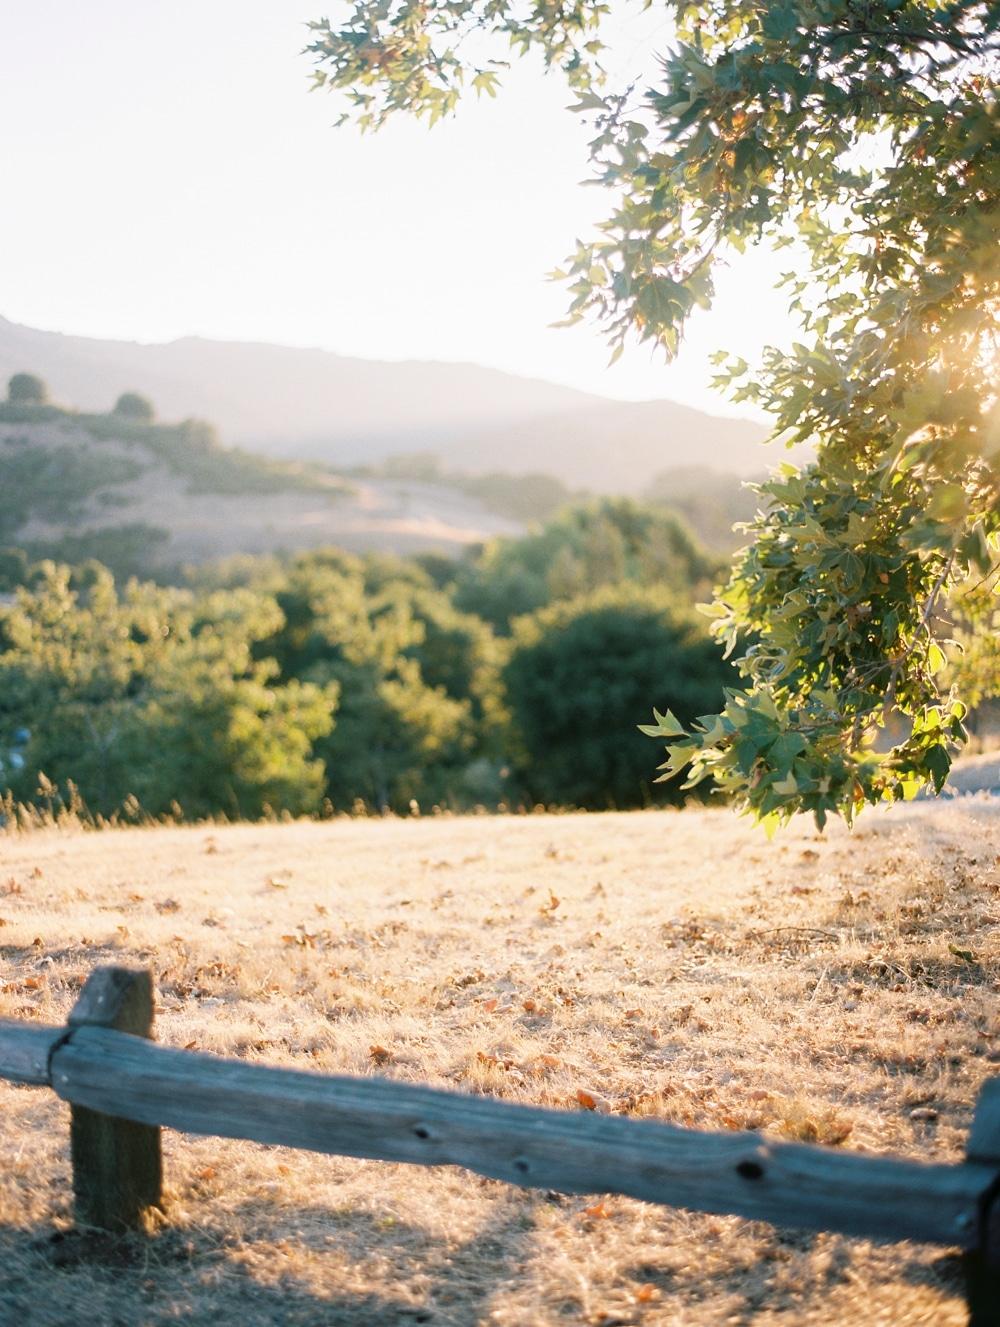 Kristin-La-Voie-Photography-california-wedding-photographer-dog-session-rancho-san-antonio-los-altos-40